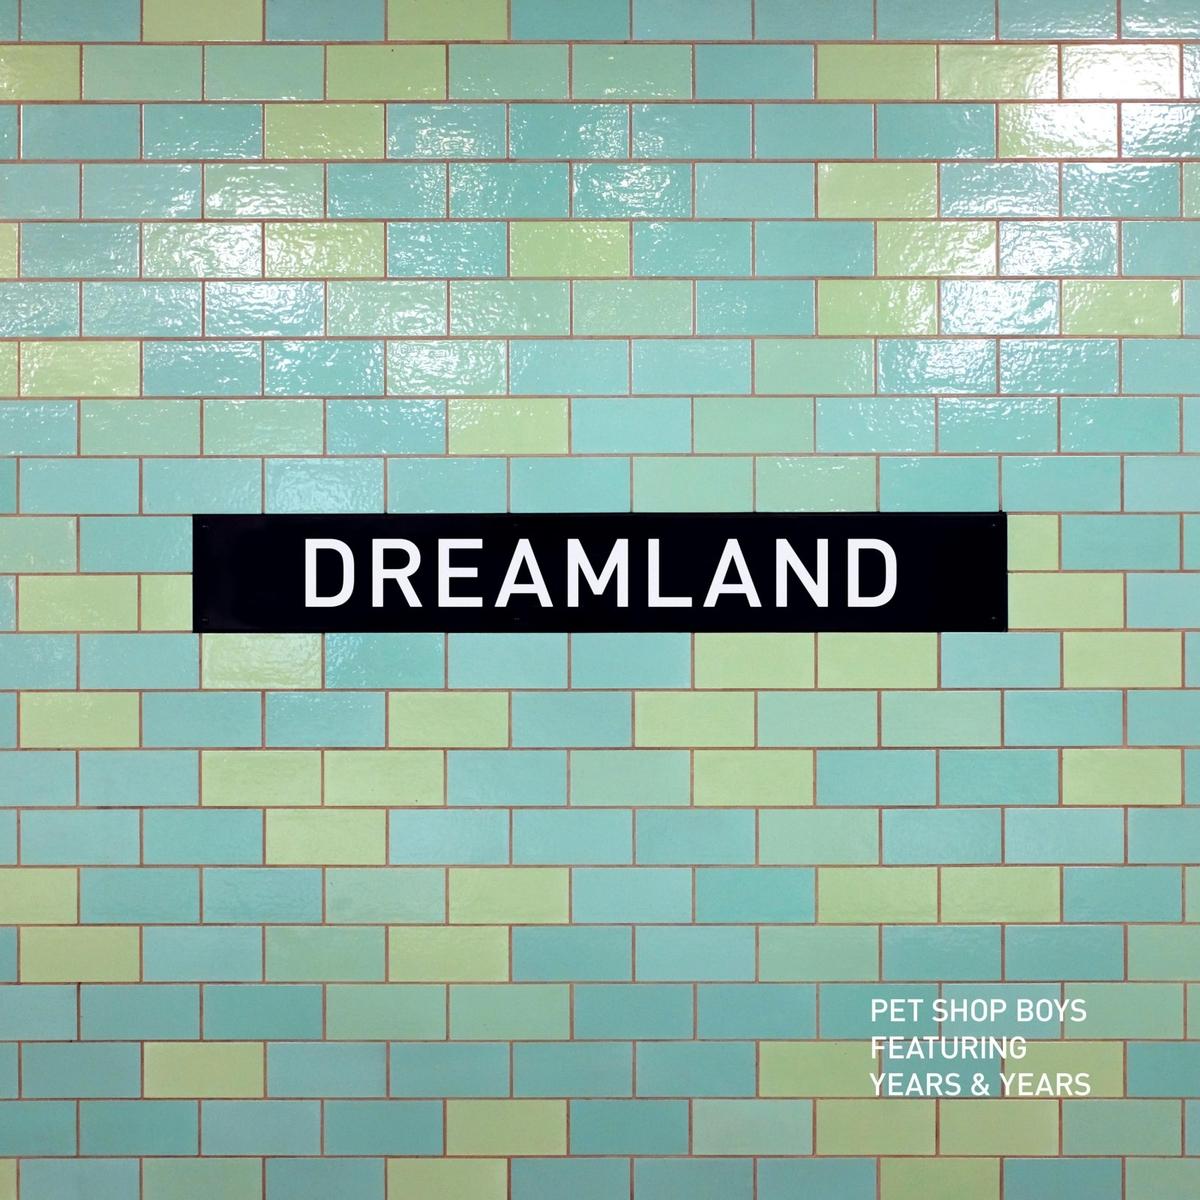 pet_shop_boys_feat_years_years-dreamland_s.jpg?312781